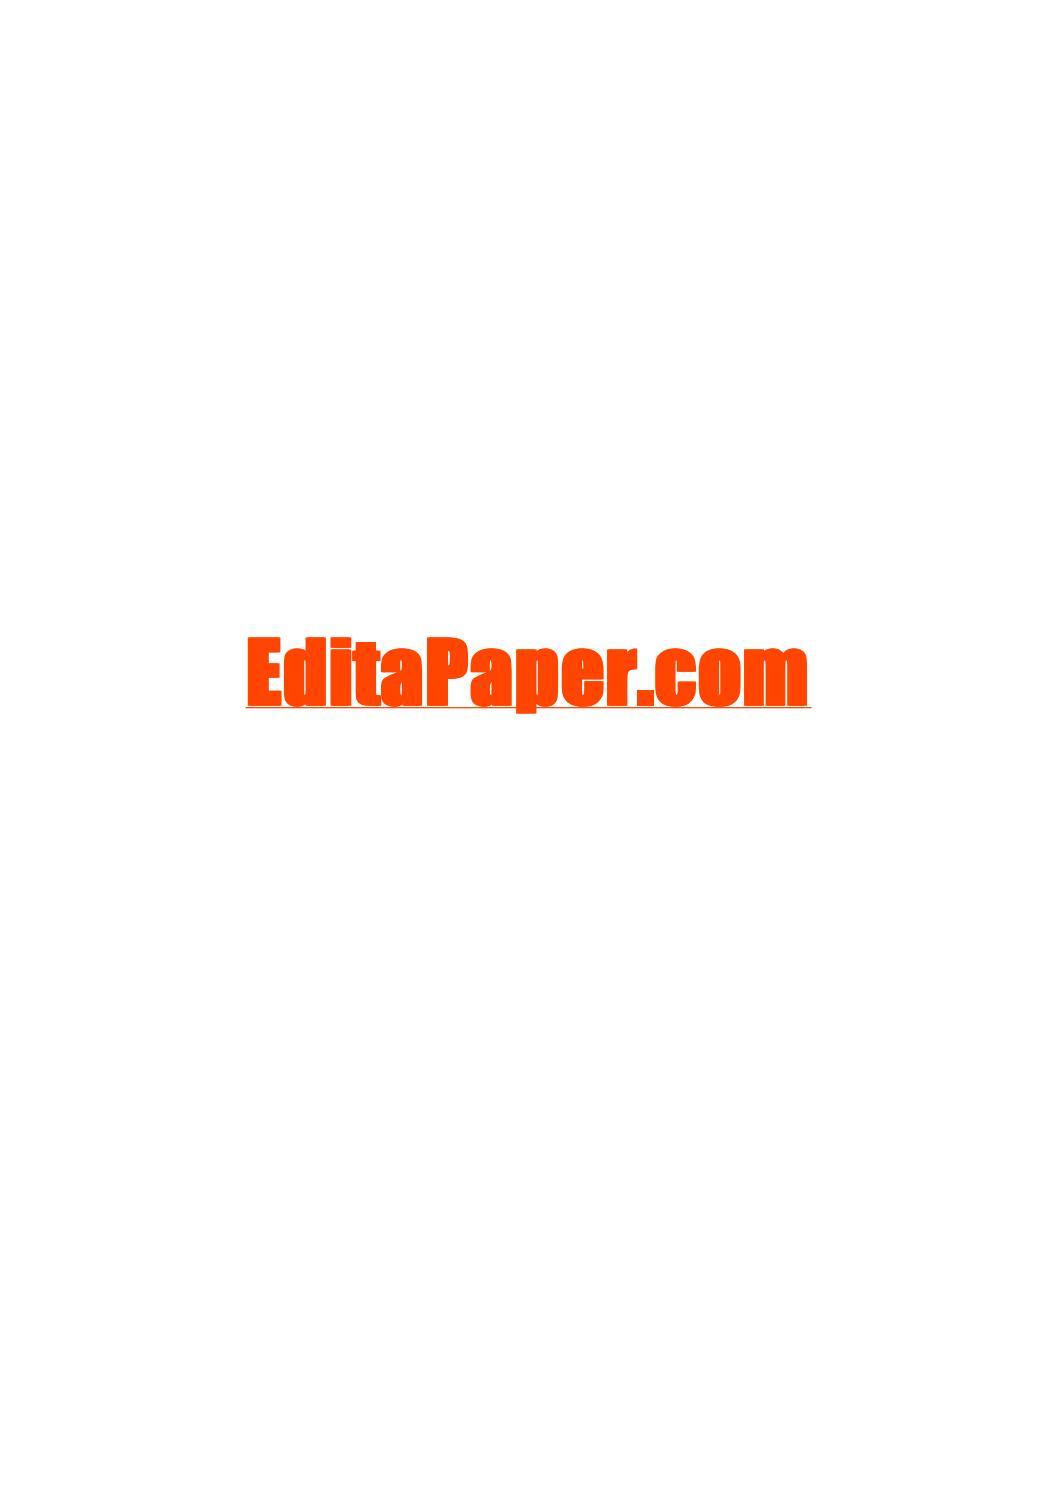 Custom analysis essay editor services for school